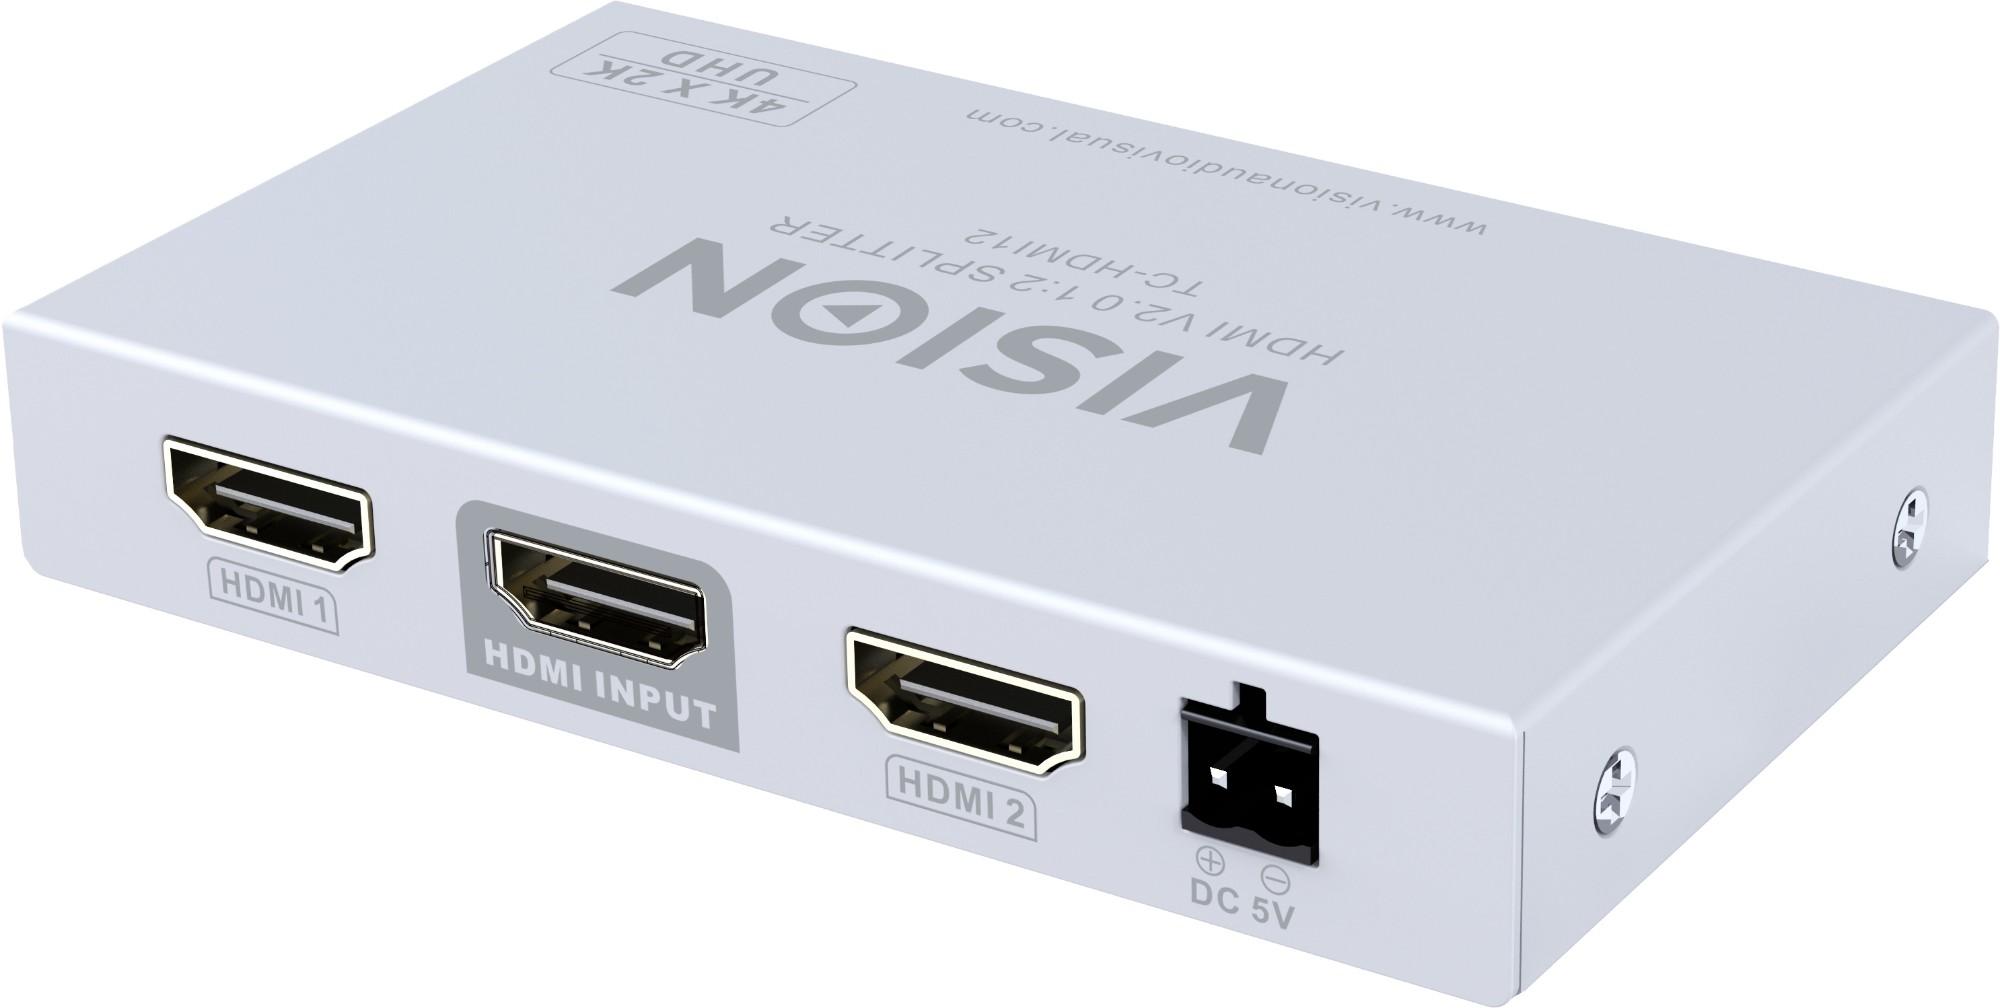 Vision TC-HDMI12 HDMI video splitter